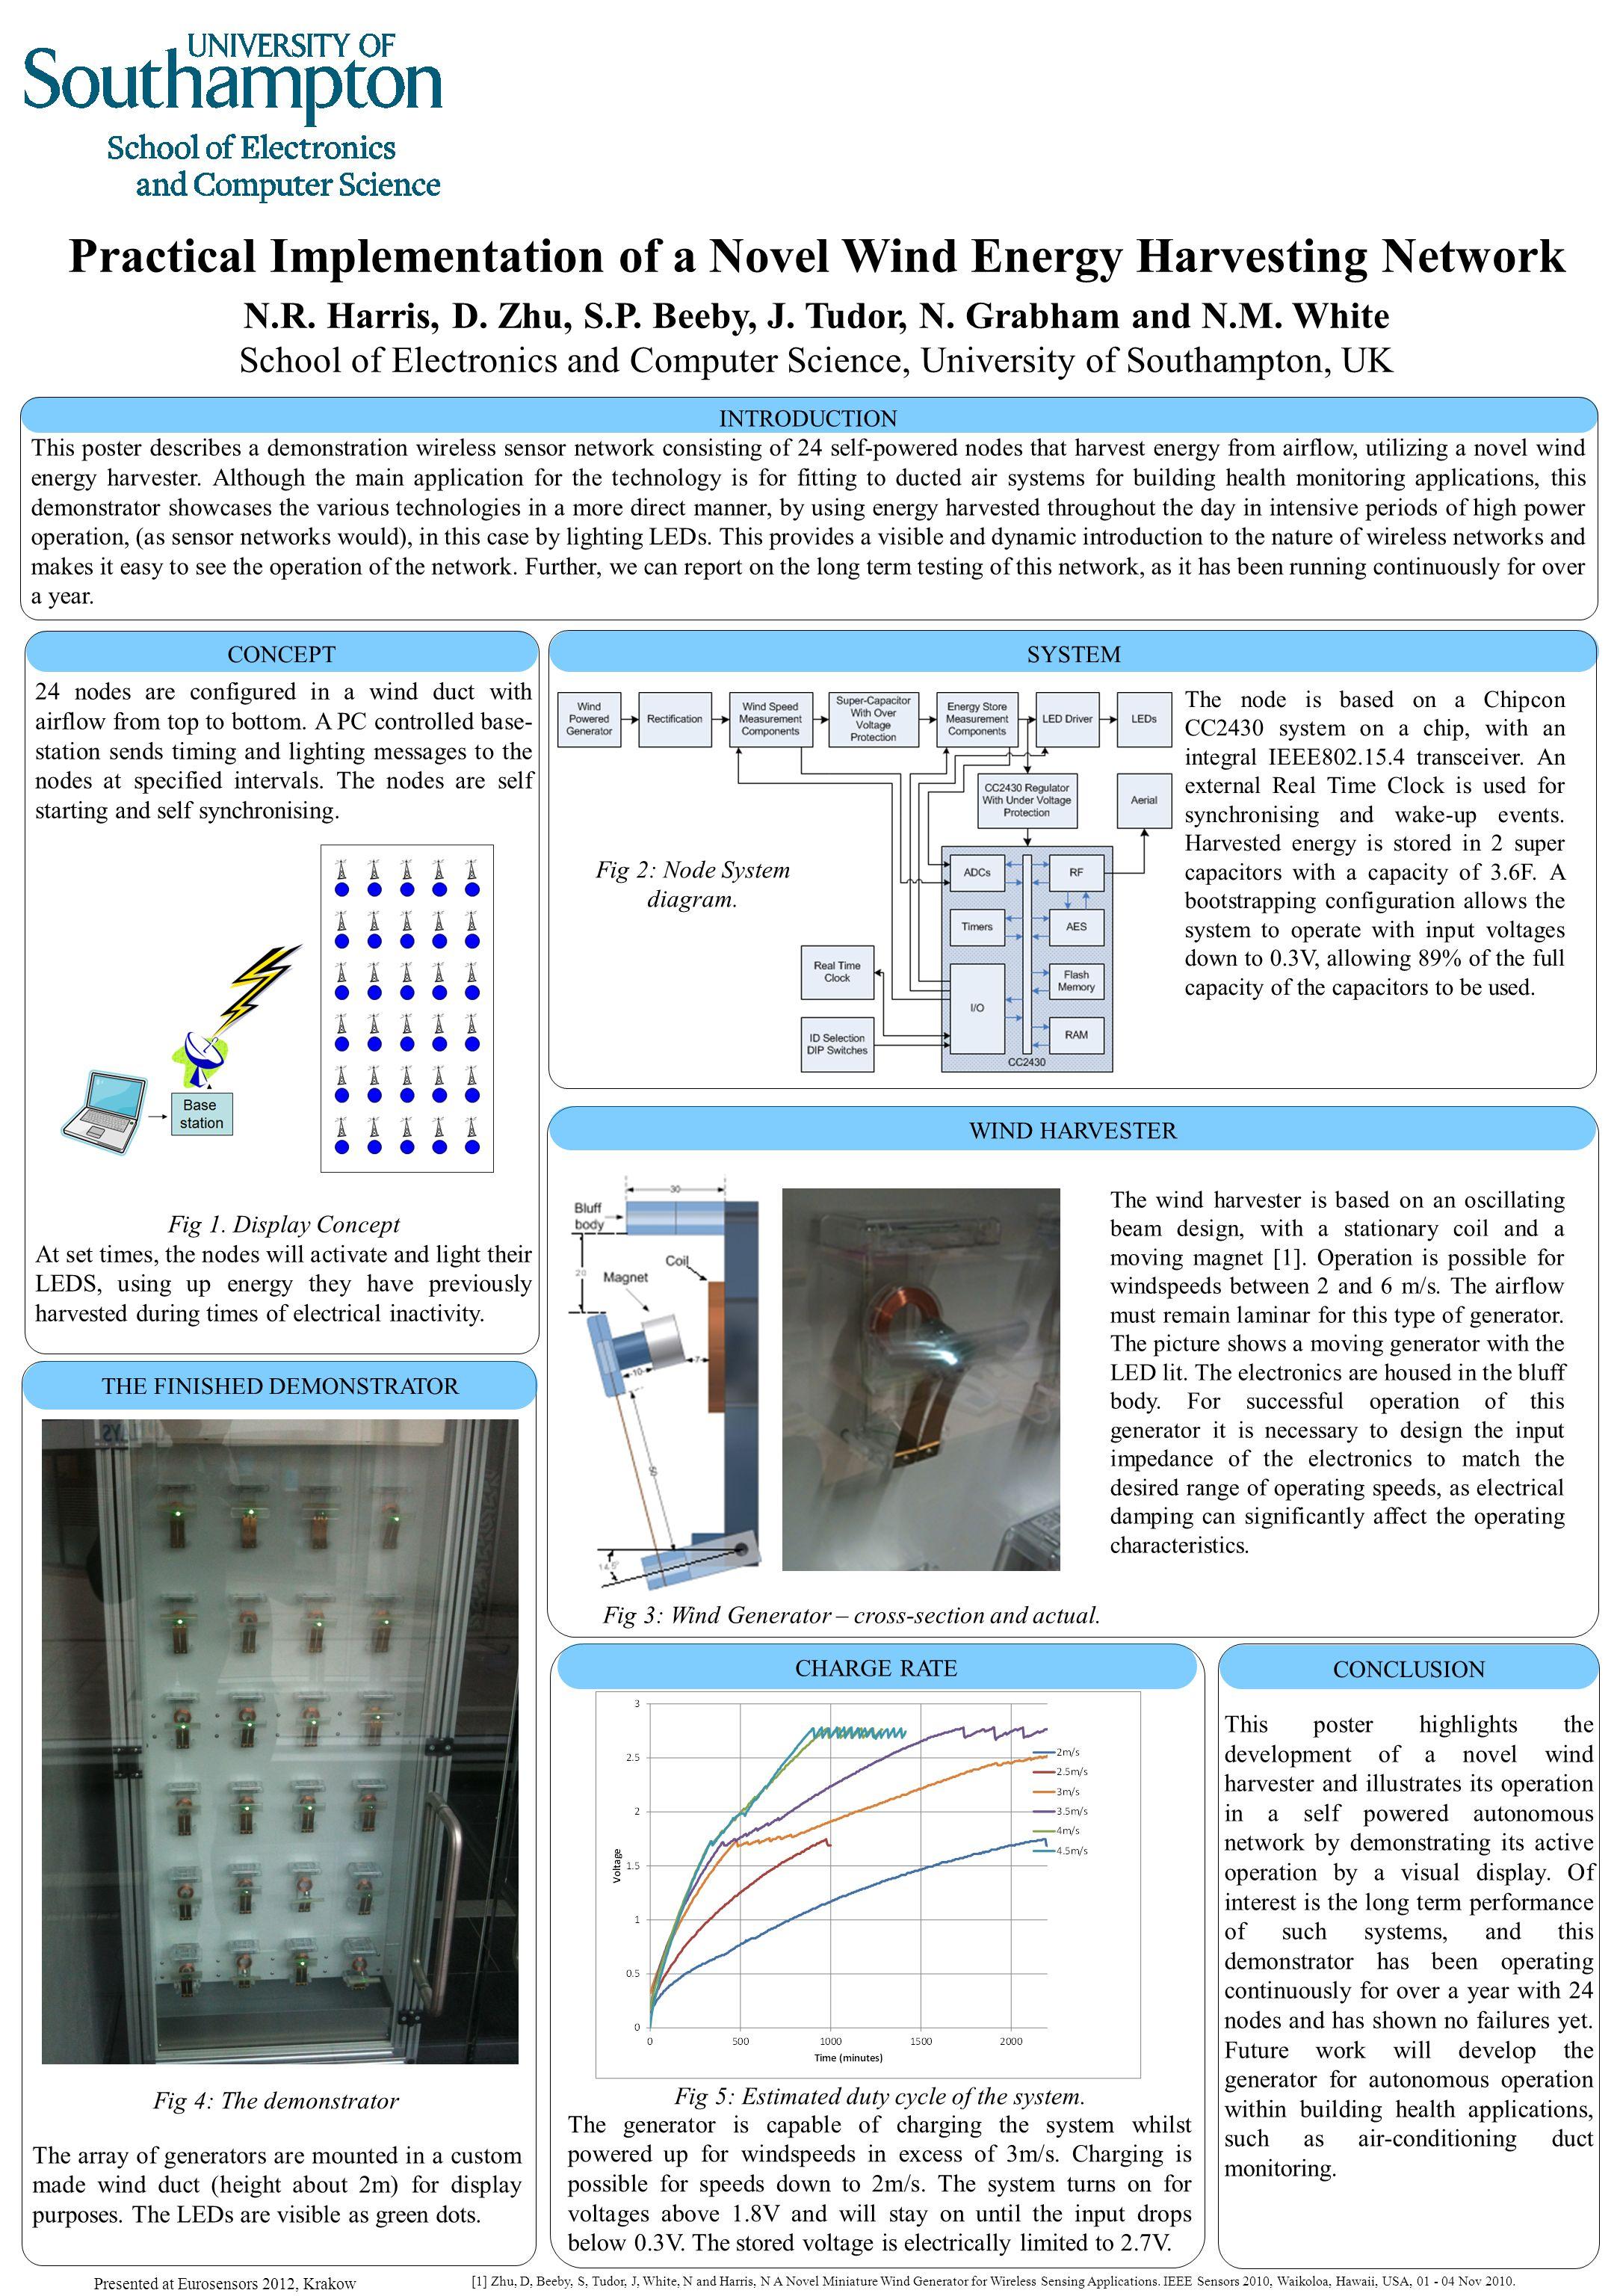 SYSTEMCONCEPT Practical Implementation of a Novel Wind Energy Harvesting Network N.R. Harris, D. Zhu, S.P. Beeby, J. Tudor, N. Grabham and N.M. White